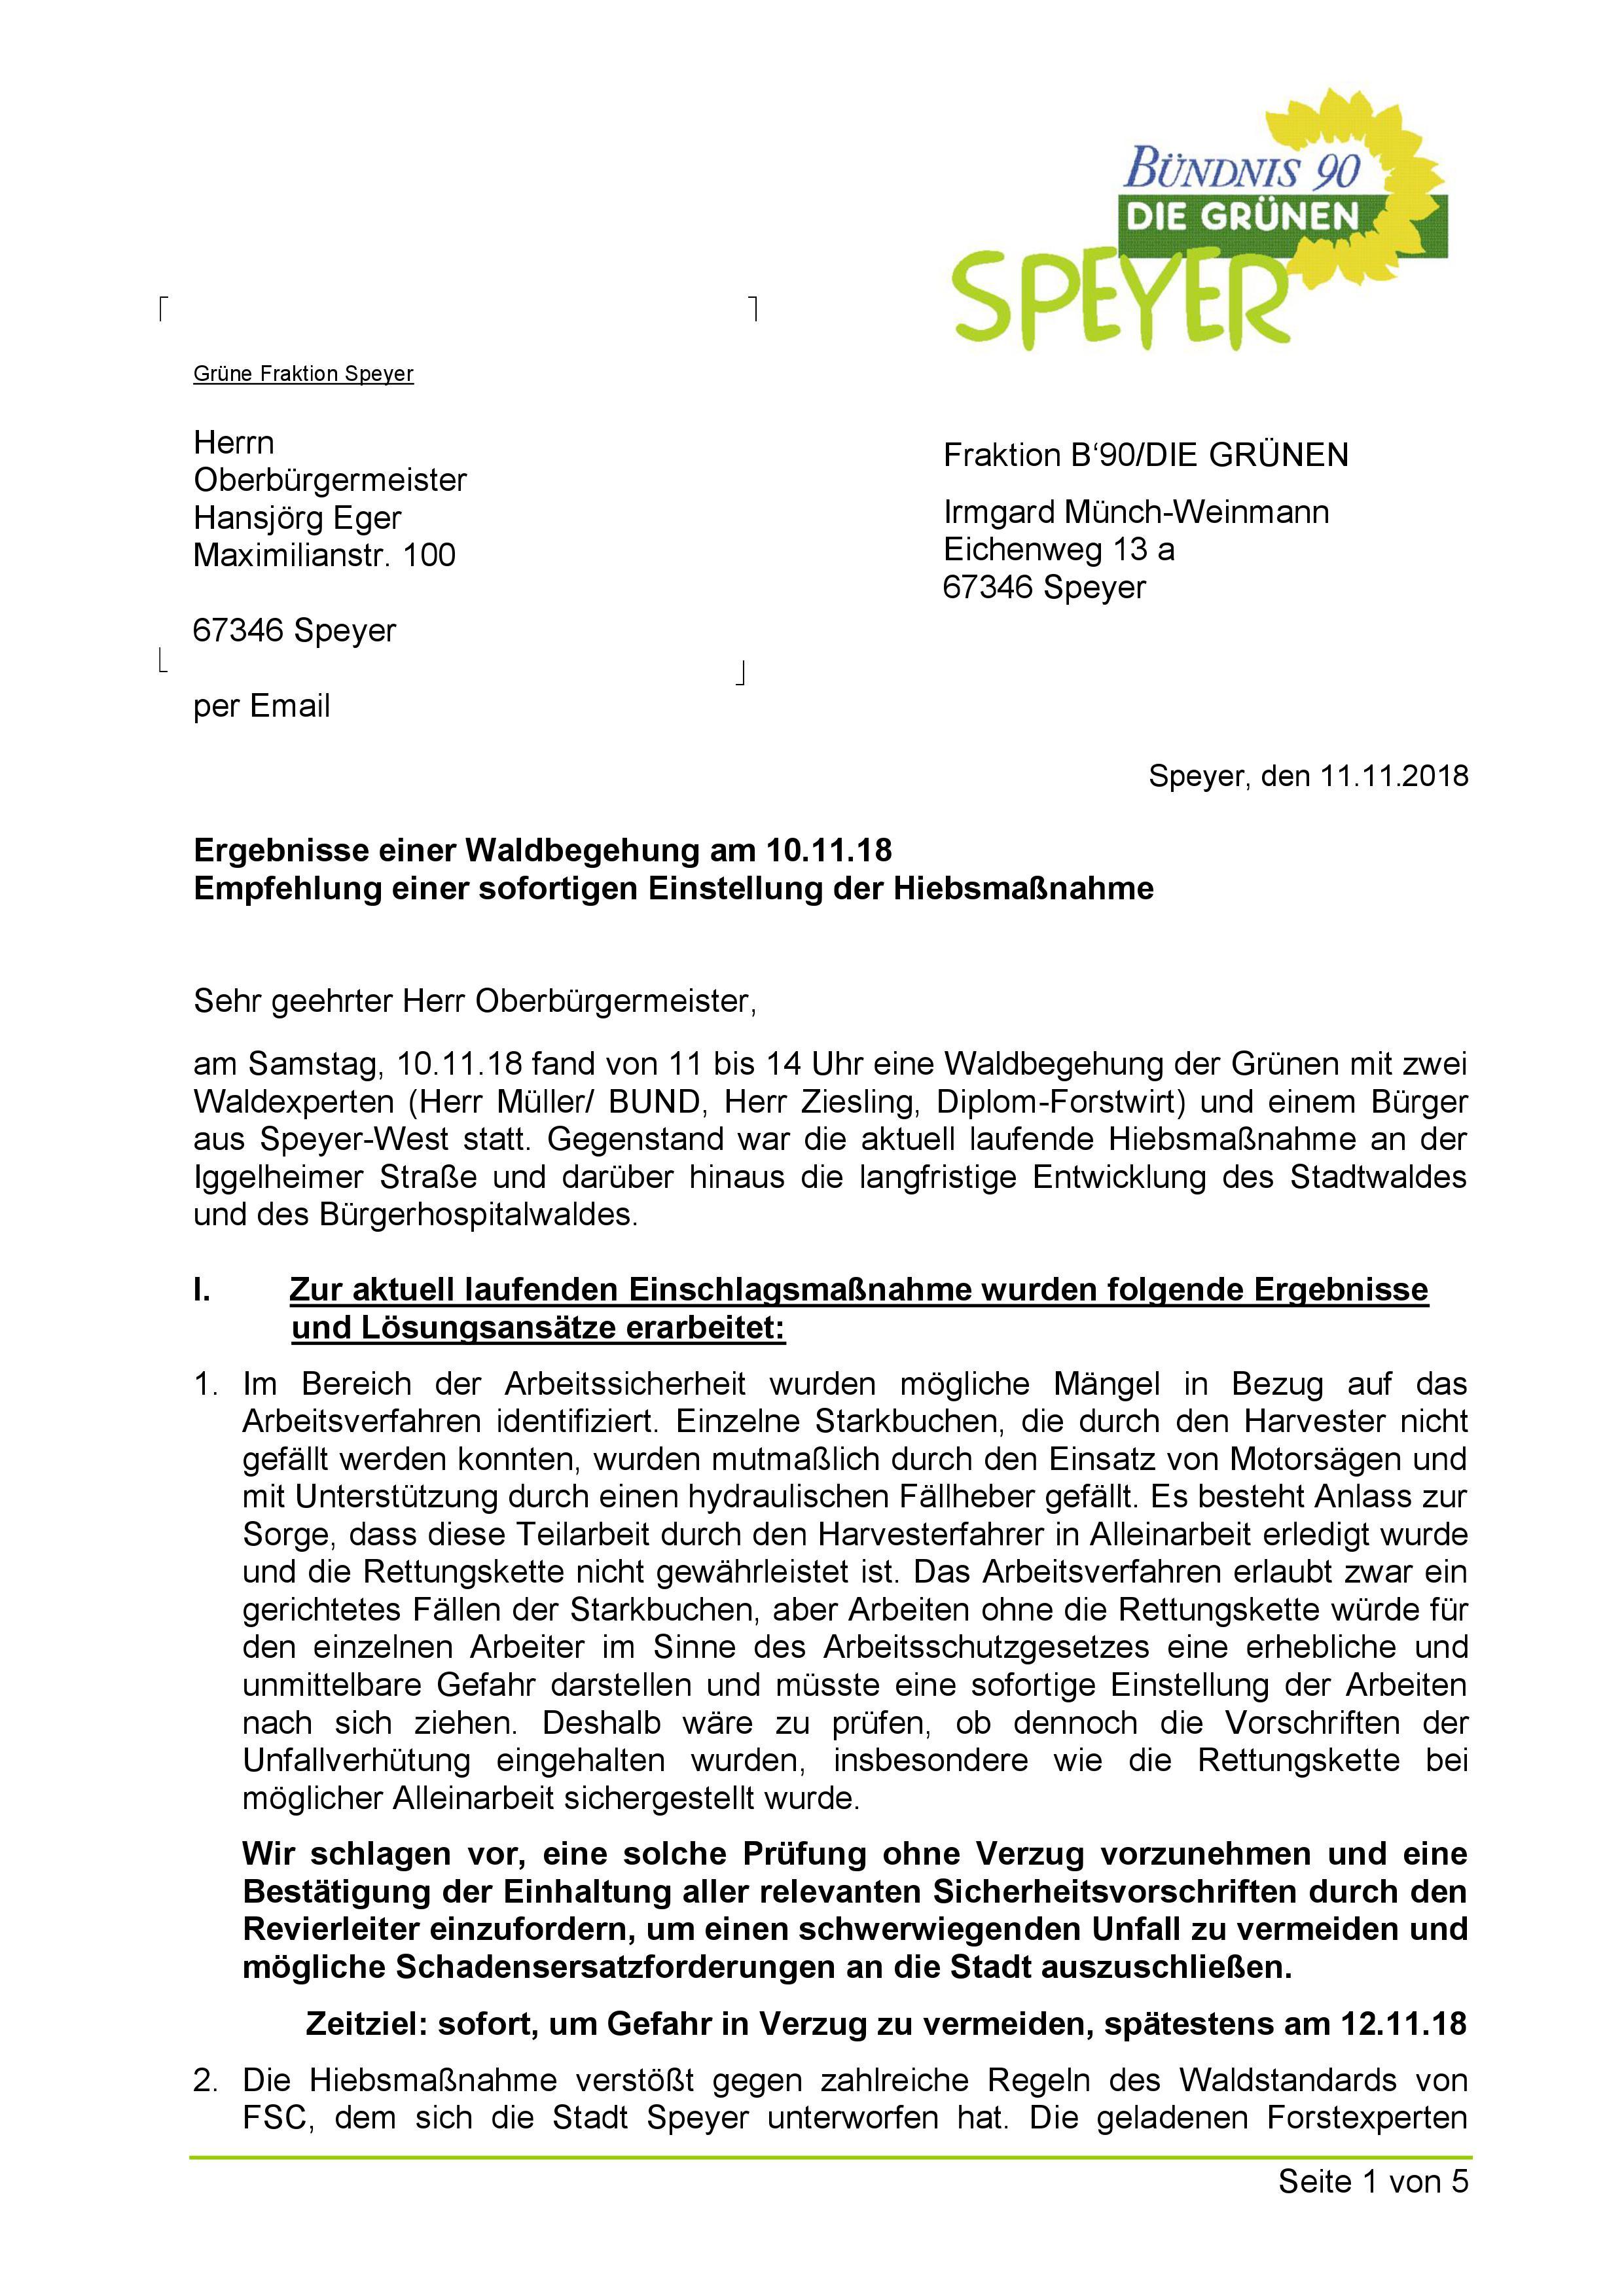 Schreiben an OB Eger / Sofortige Einstellung der Hiebsmaßnahmen im Stadtwald